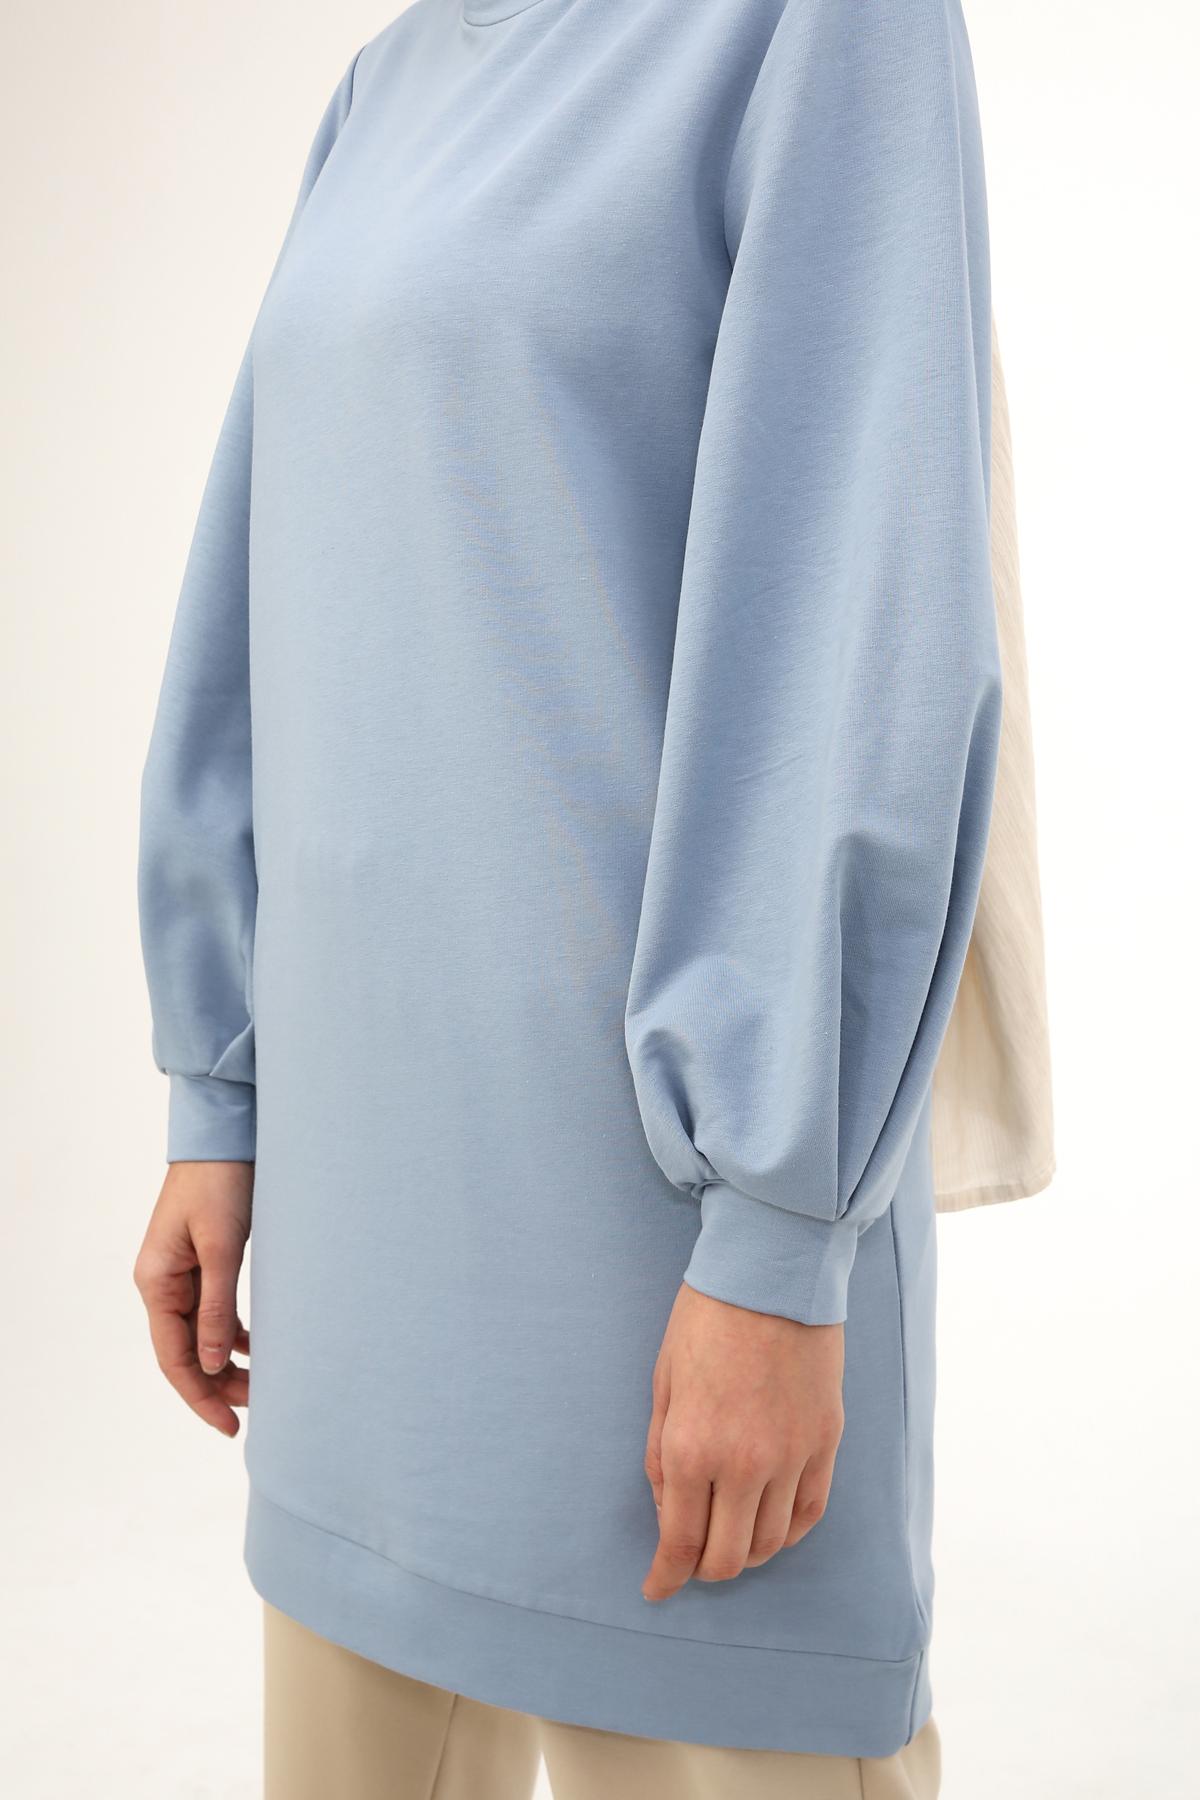 Balloon Sleeve Basic Sweatshirt